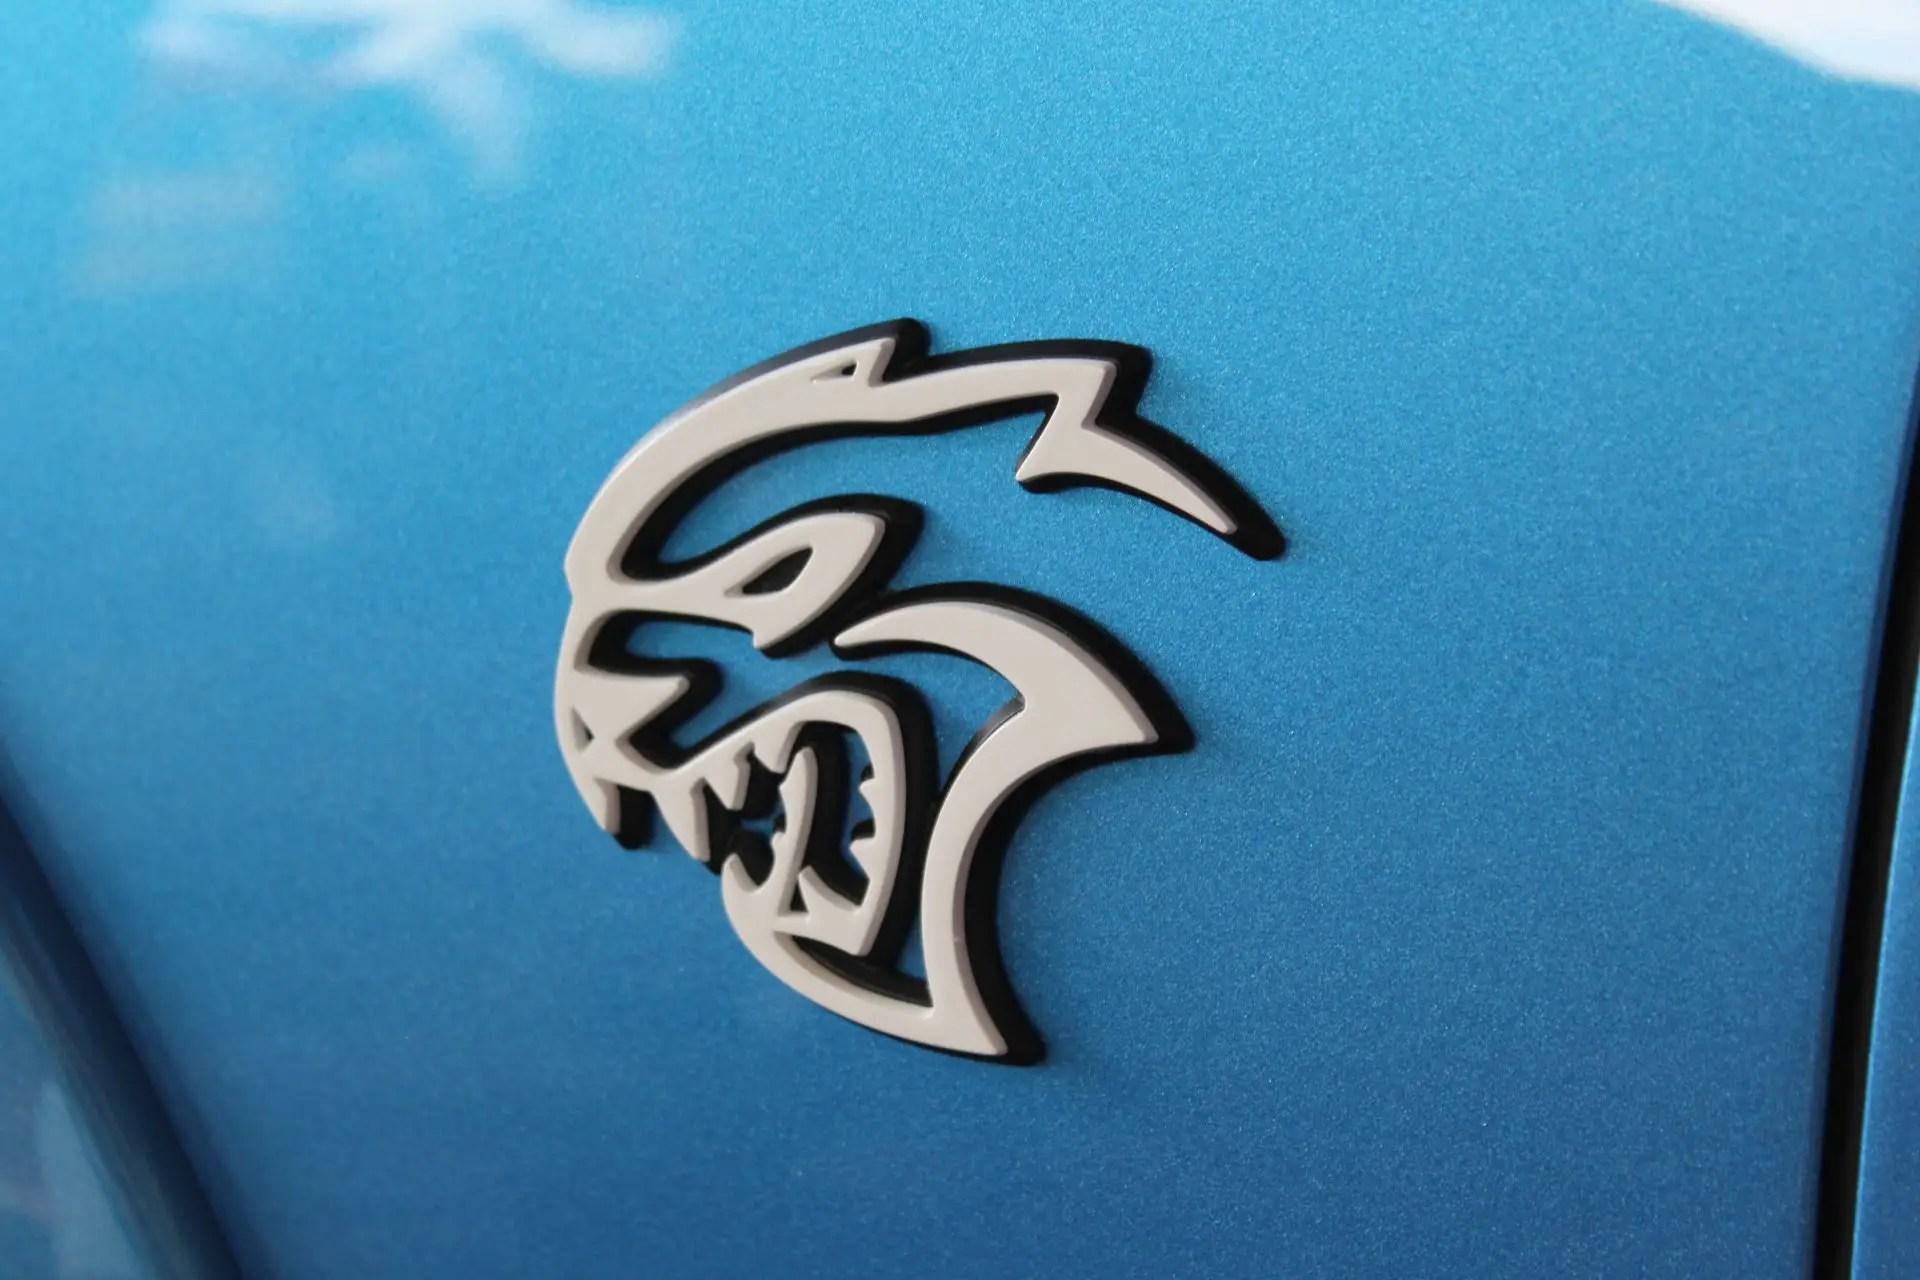 Hellcat V8 Engine Dodge Charger Daytona 50th Anniversary Edition